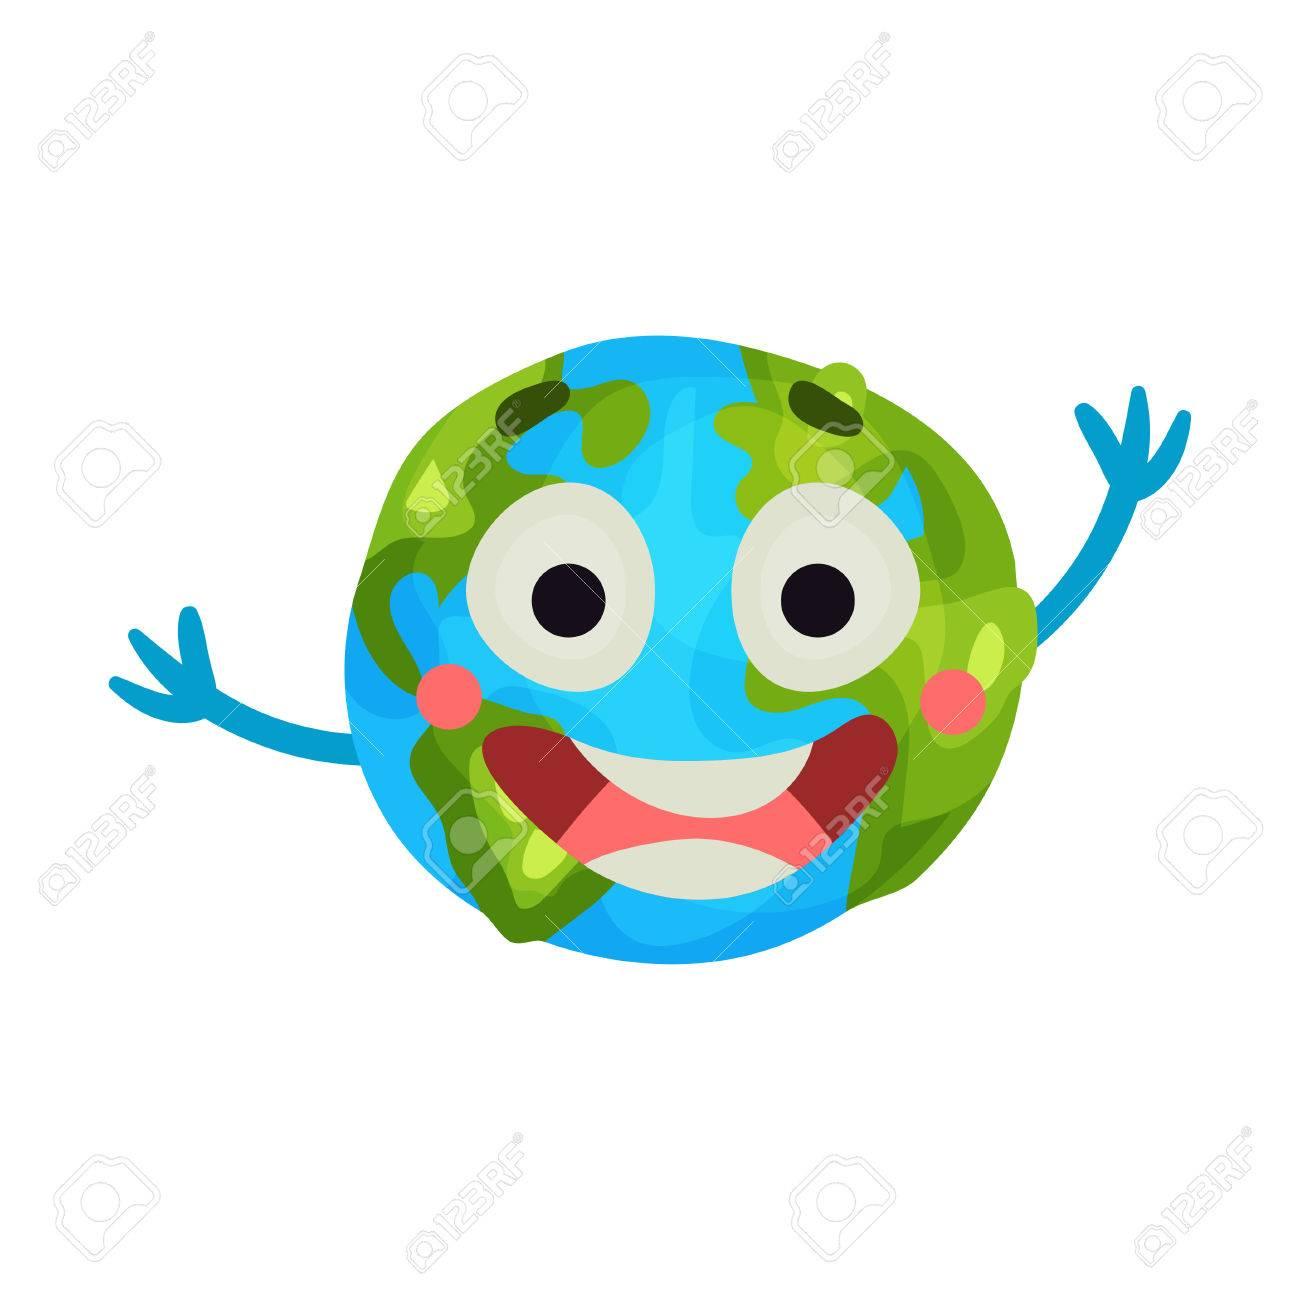 Cute Cartoon Laughing Earth Planet Emoji Happy Globe Face Colorful